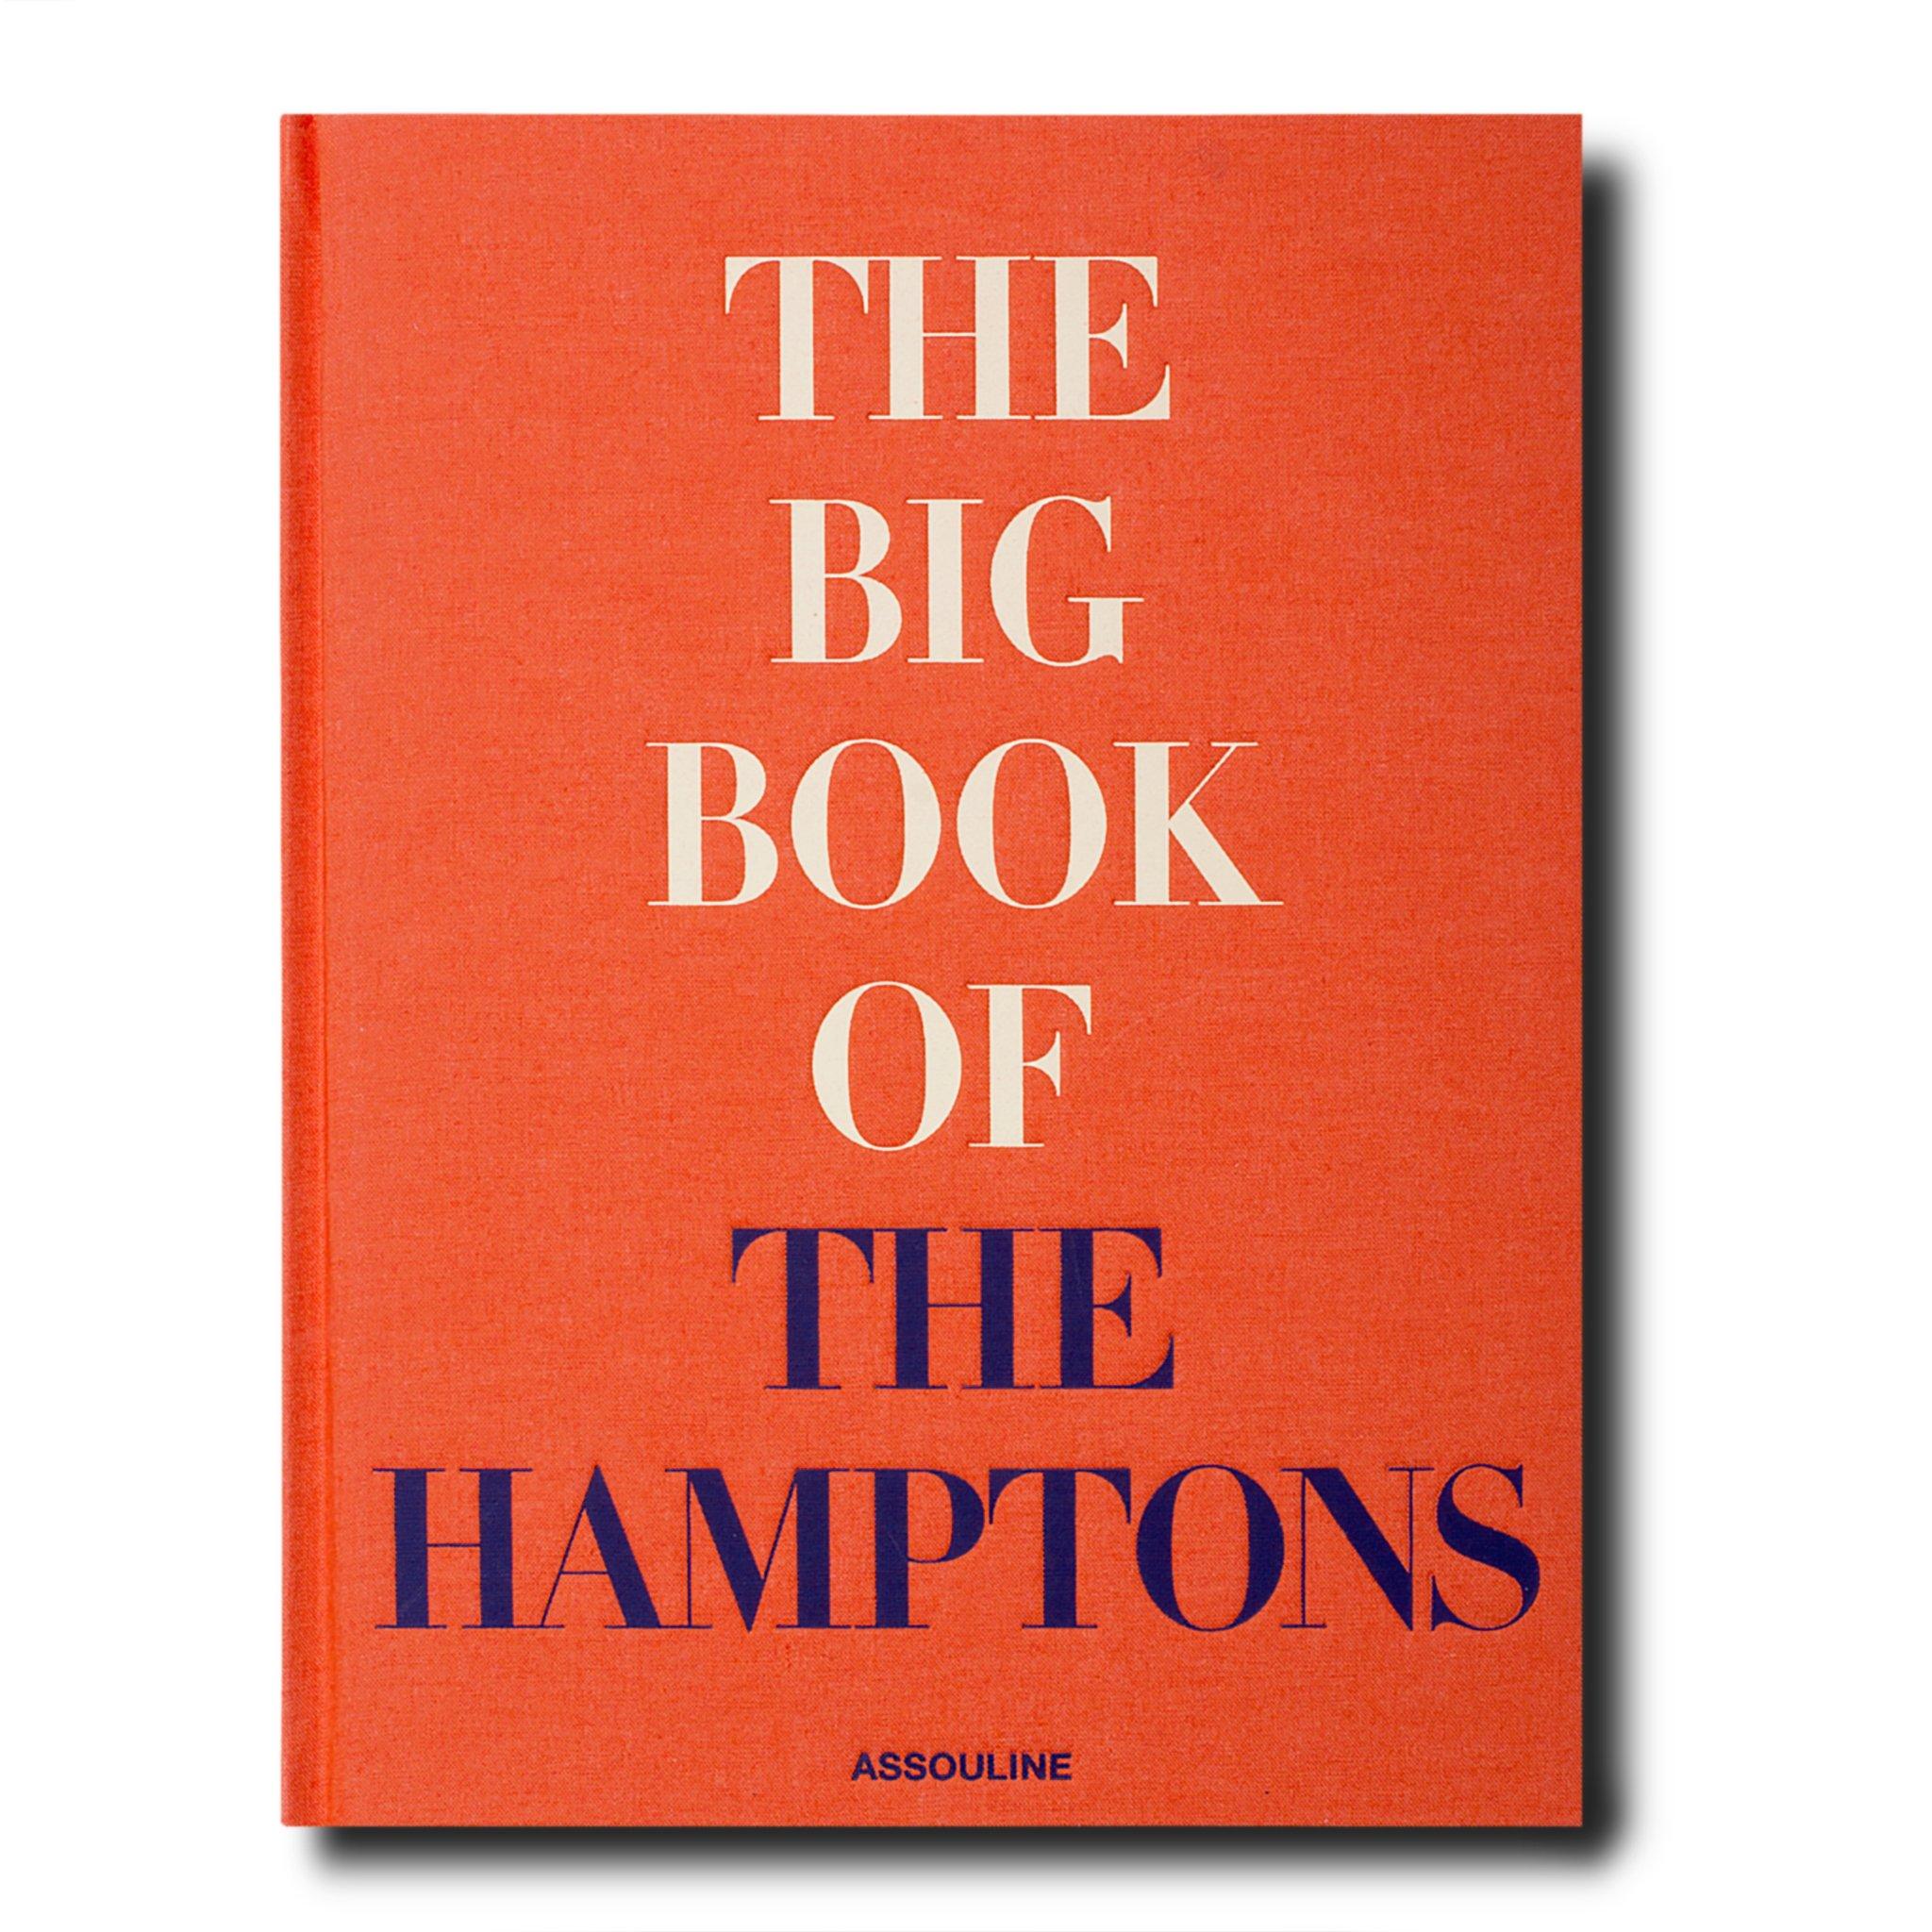 BIG-BOOK-OF-HAMPTONS-A_2048x.jpg